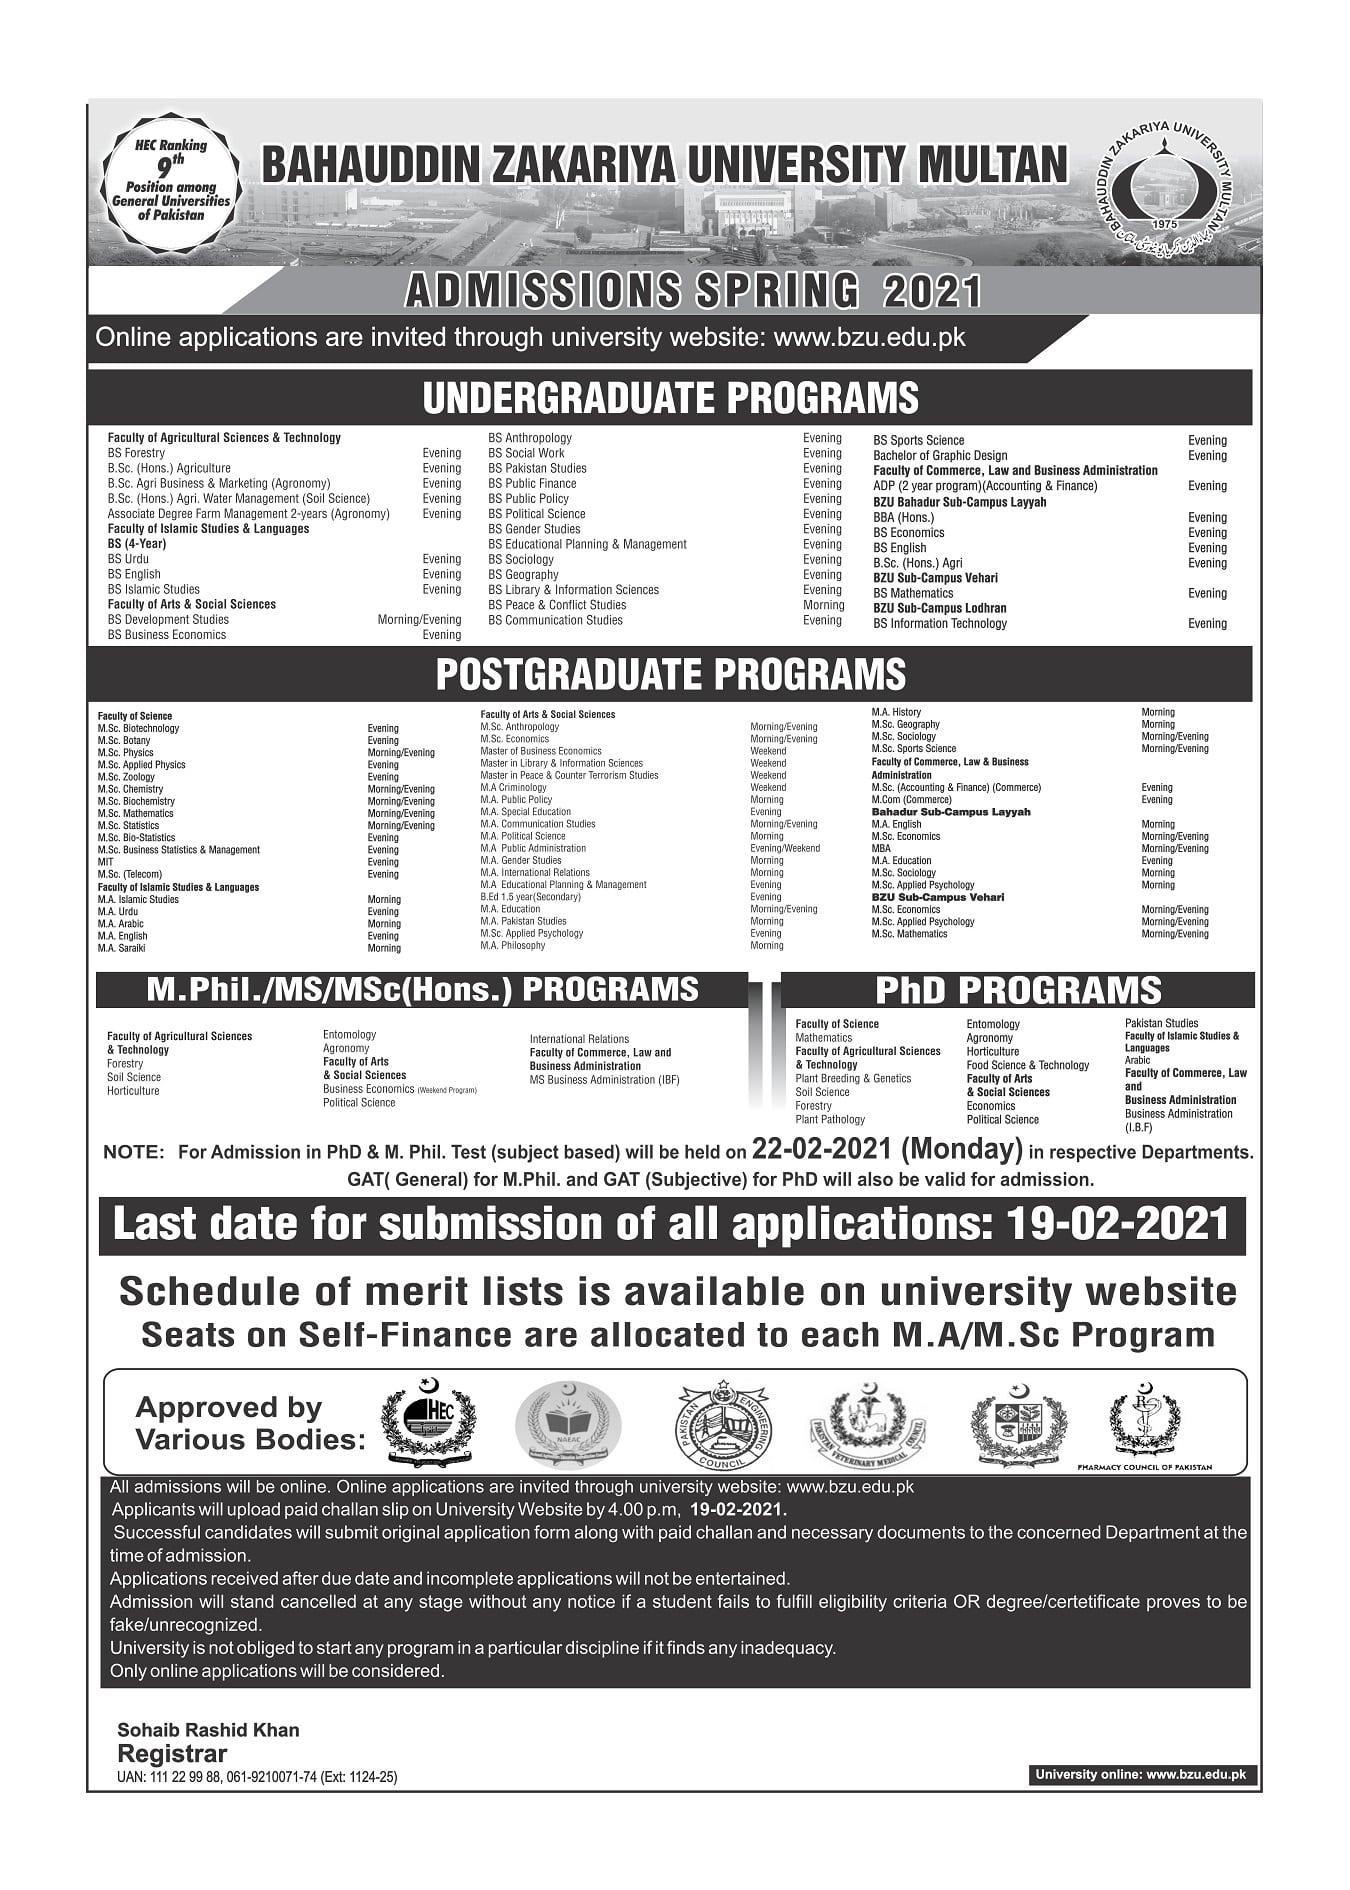 Bahauddin Zakariya University Admission 2021 Registration Schedule Eligibility Criteria